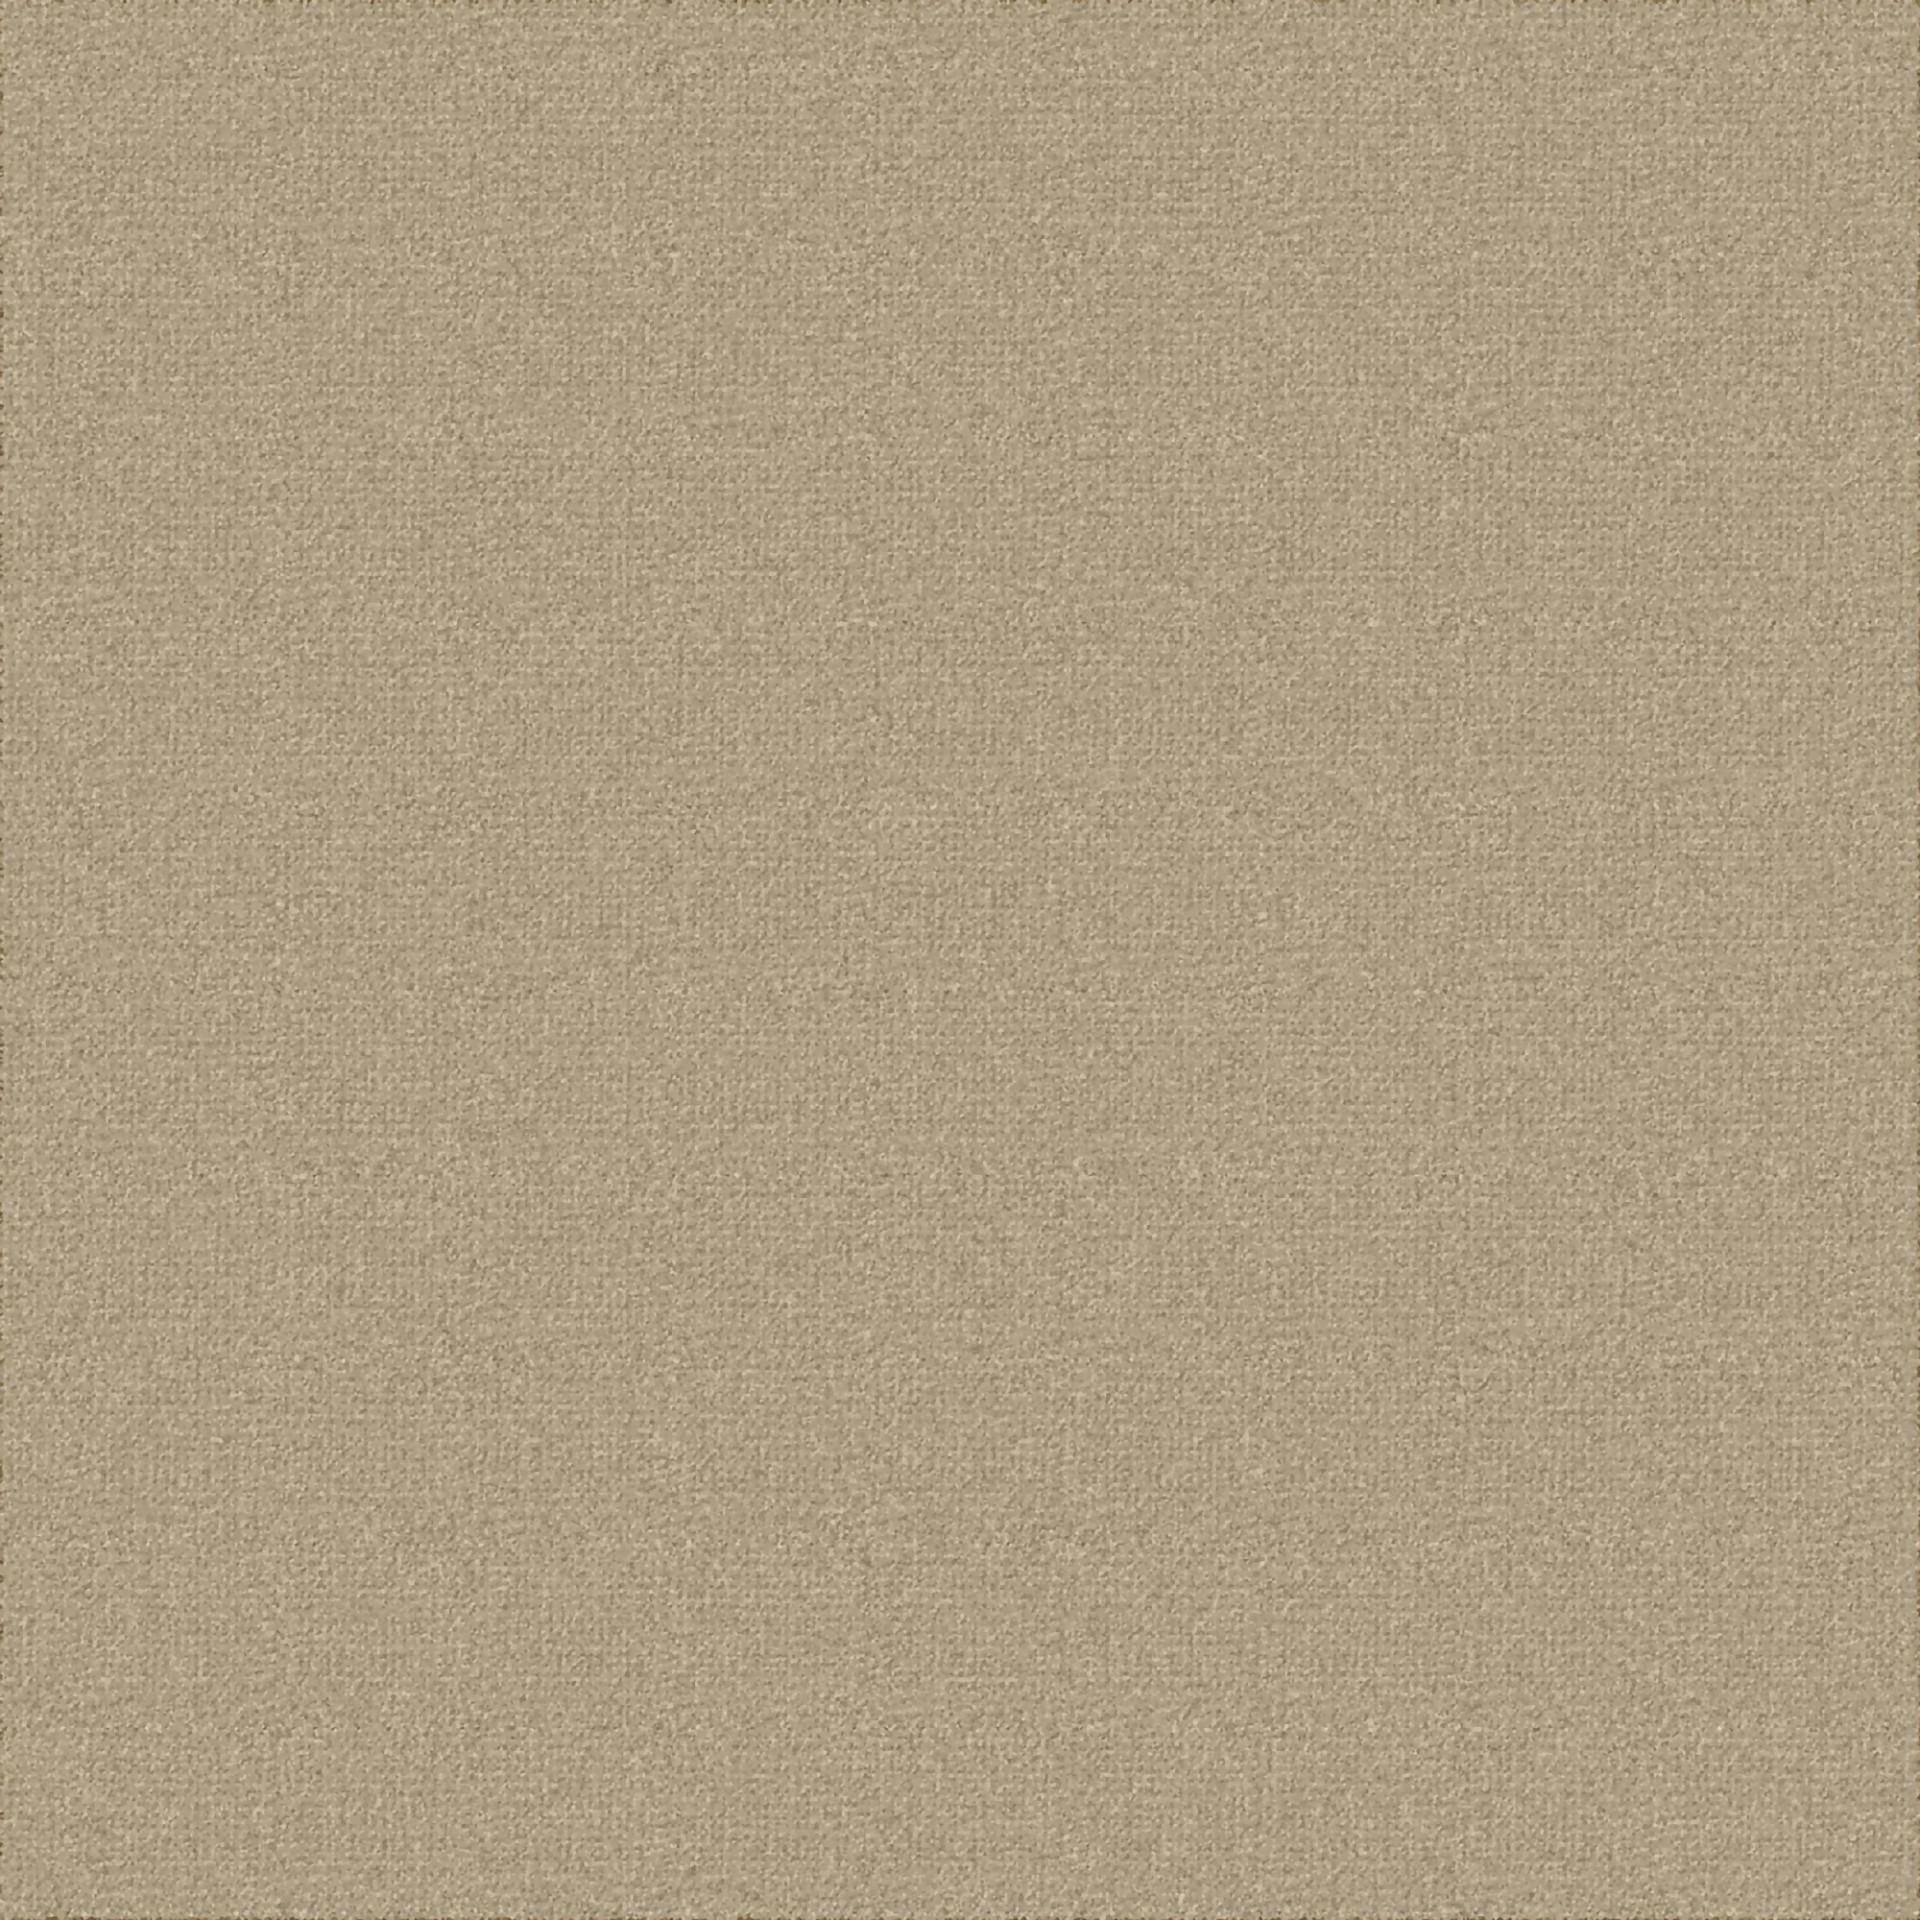 Texturebackgroundpaperelegantpattern Free Photo From Needpixcom